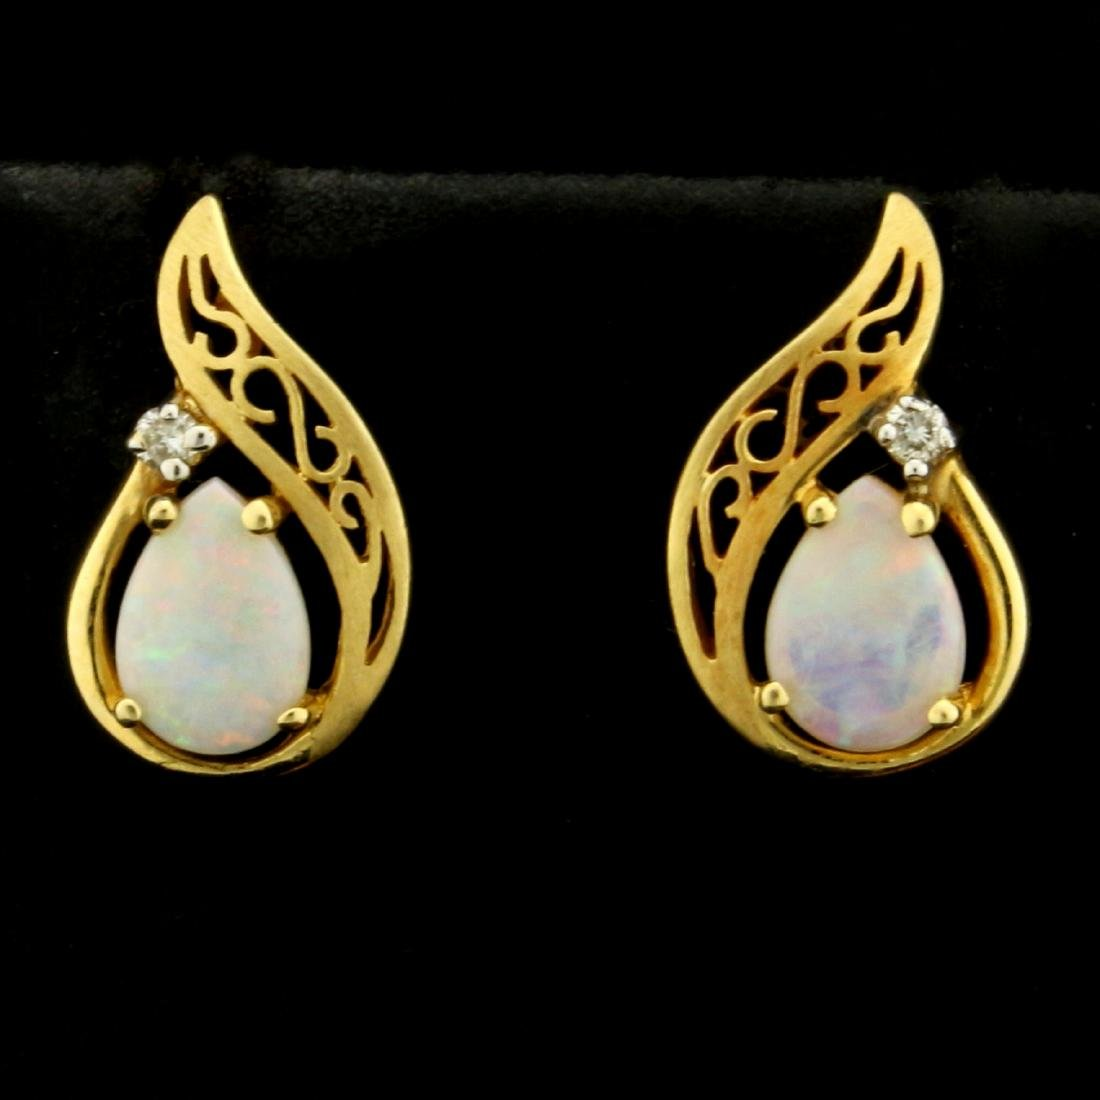 Pear Shaped Opal and Diamond Earrings in 14K Yellow